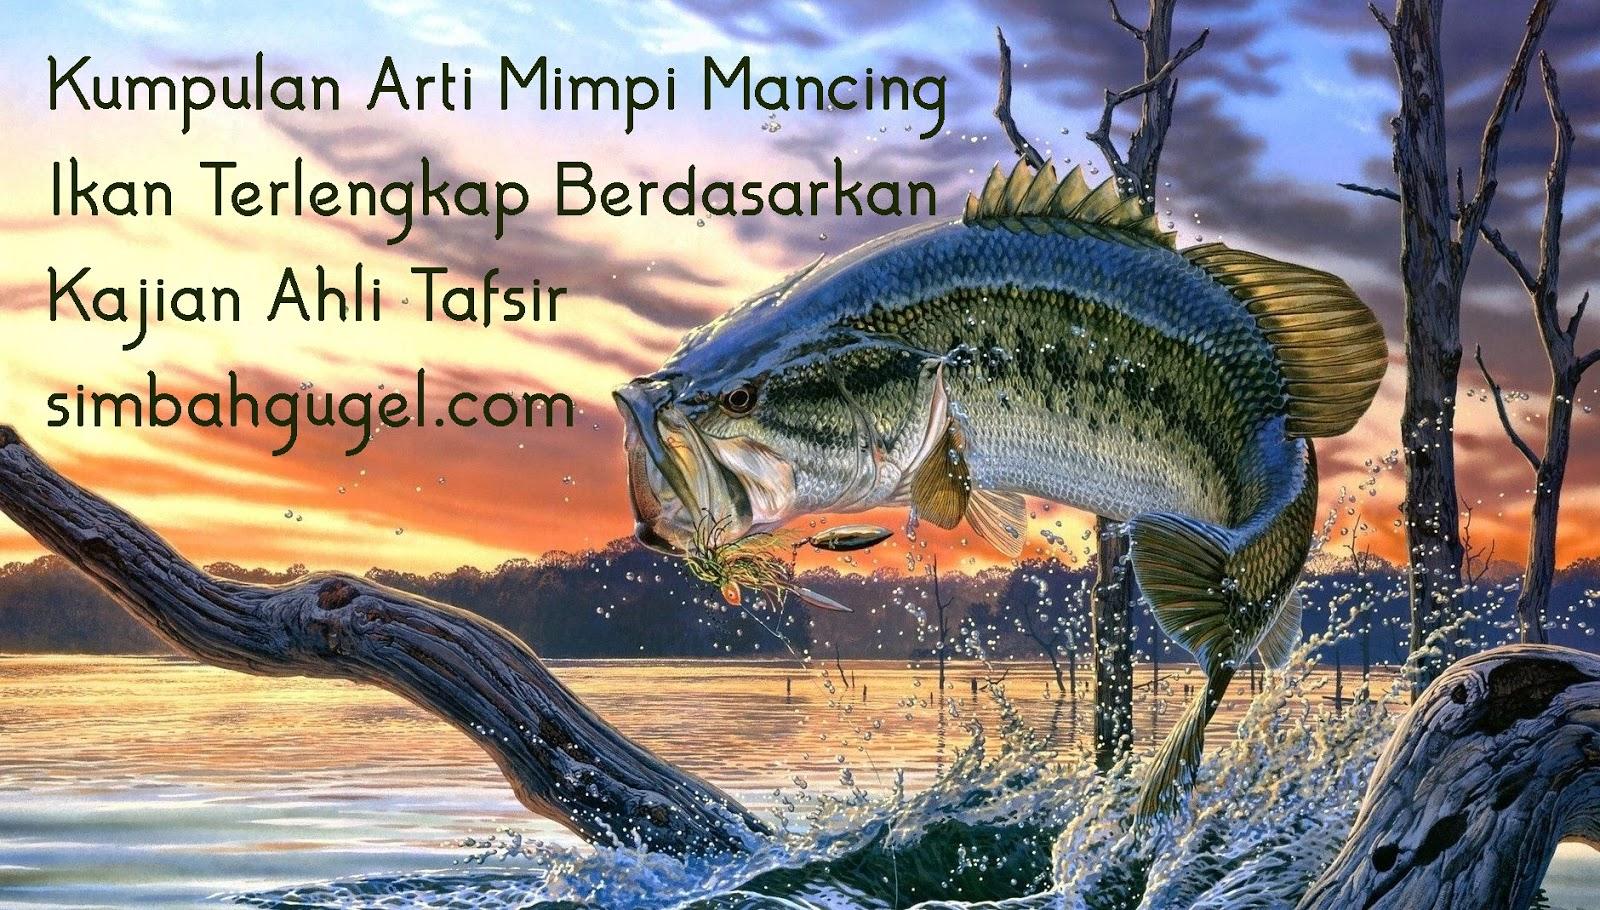 Unduh 420 Gambar Ikan Gabus Erek Erek HD Terbaru